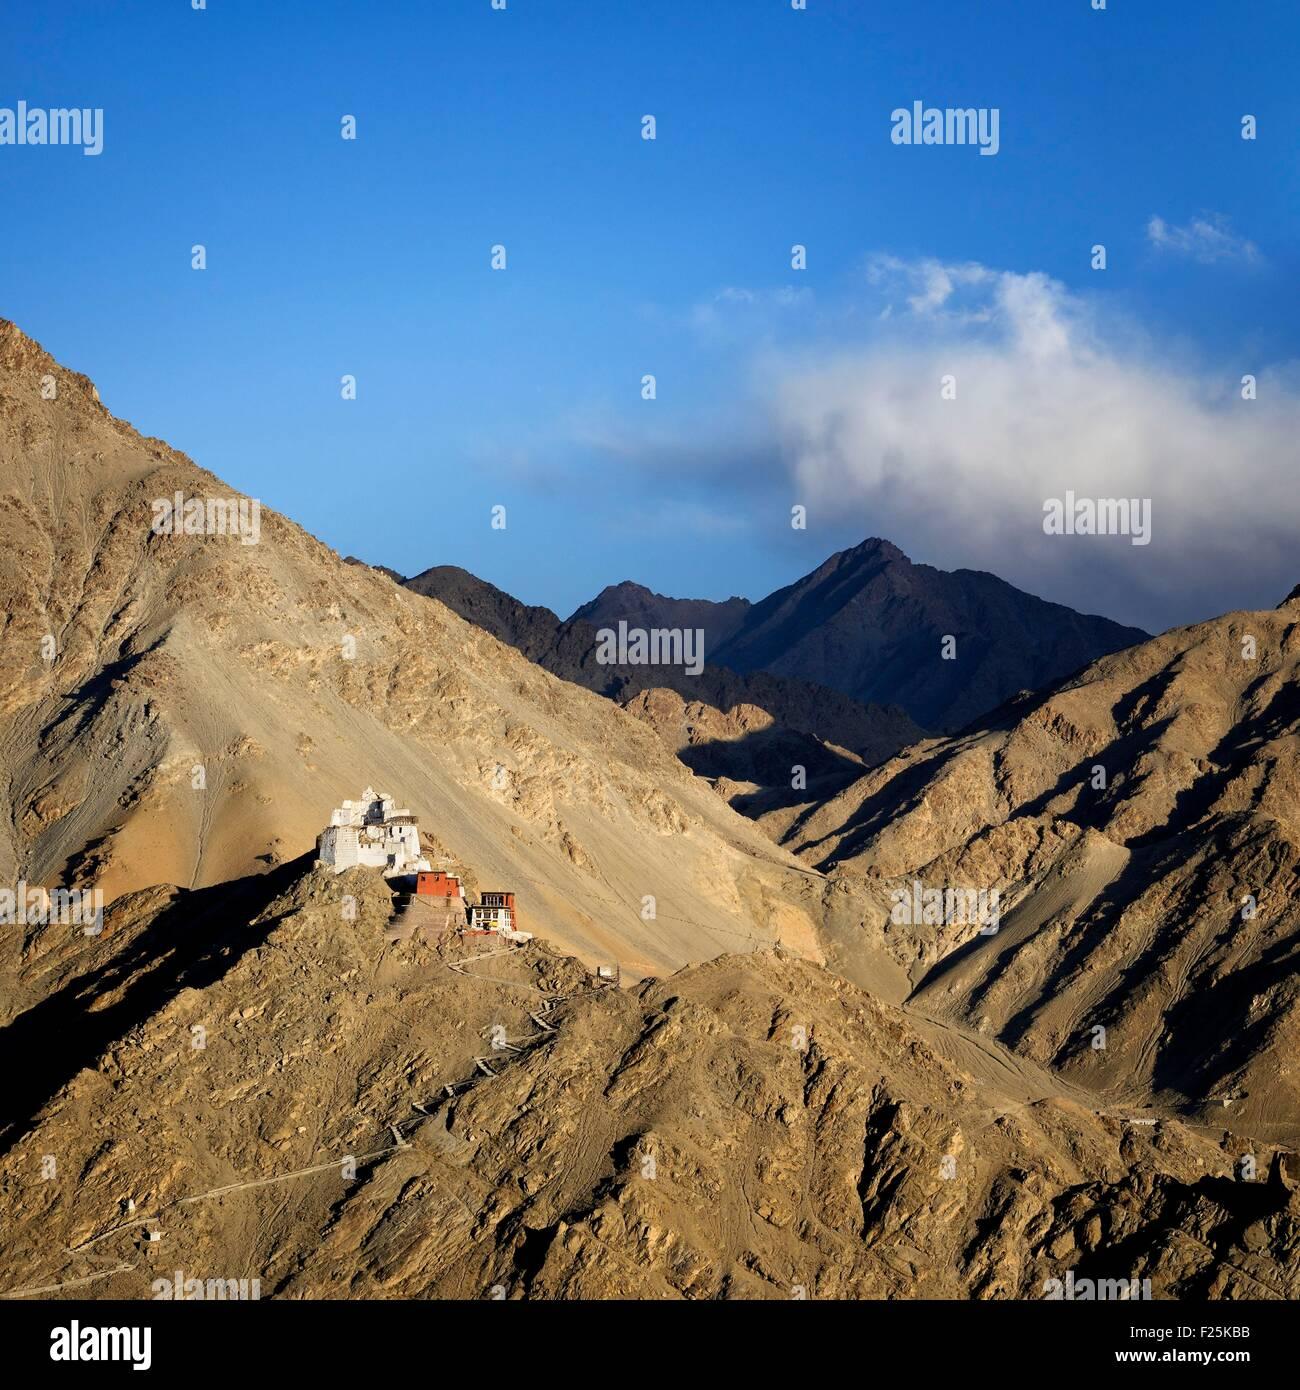 India, Jammu and Kashmir State, Himalaya, Ladakh, Indus valley, Tsemo gompa (Buddhist monastery) above the town - Stock Image